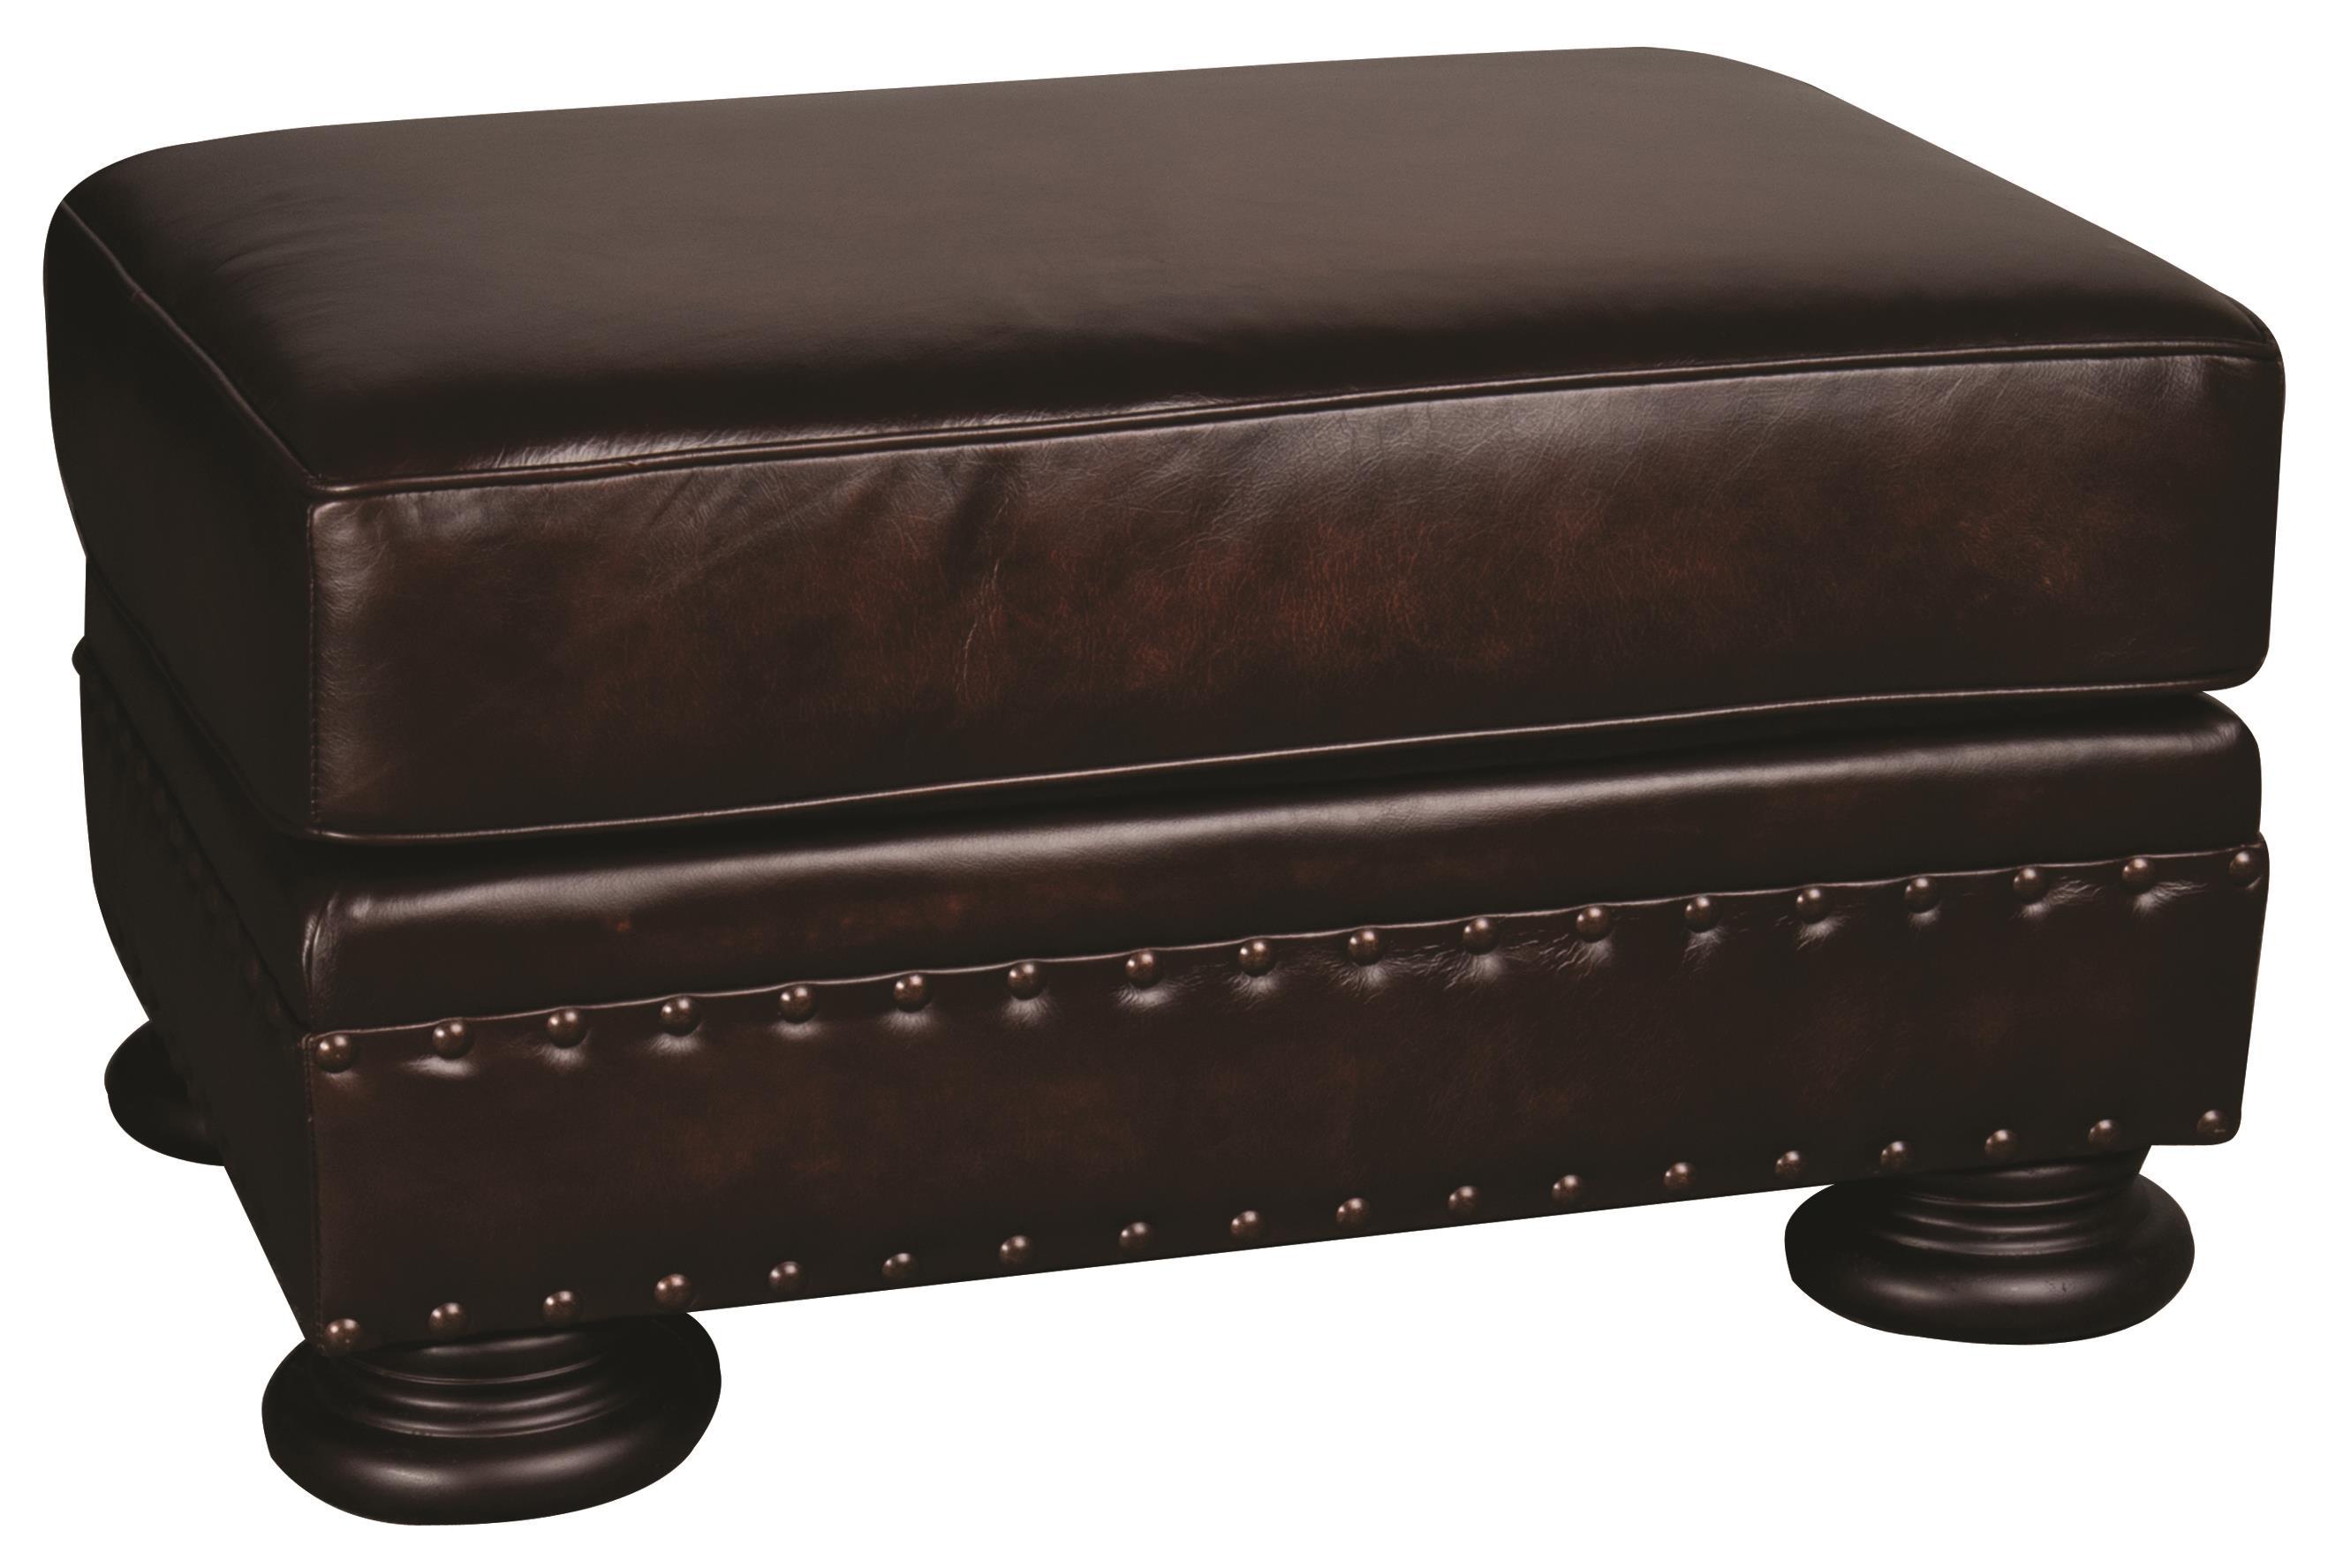 Bernhardt Foster Foster 100% Leather Ottoman - Item Number: 487147158